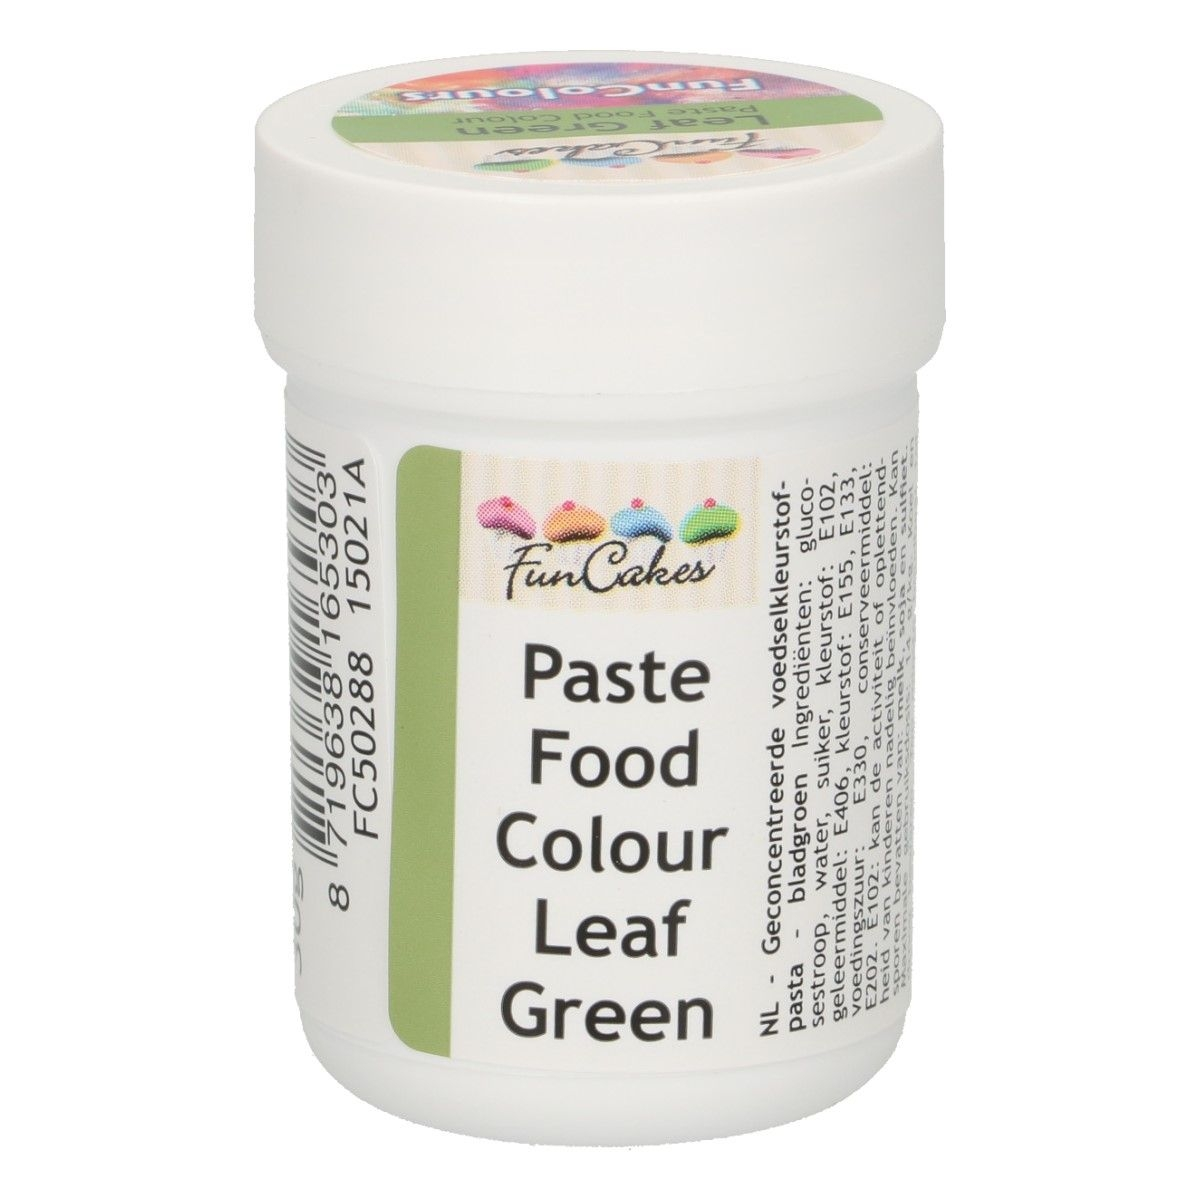 /f/u/funcakes_funcolours_paste_food_colour_-_leaf_green.jpg